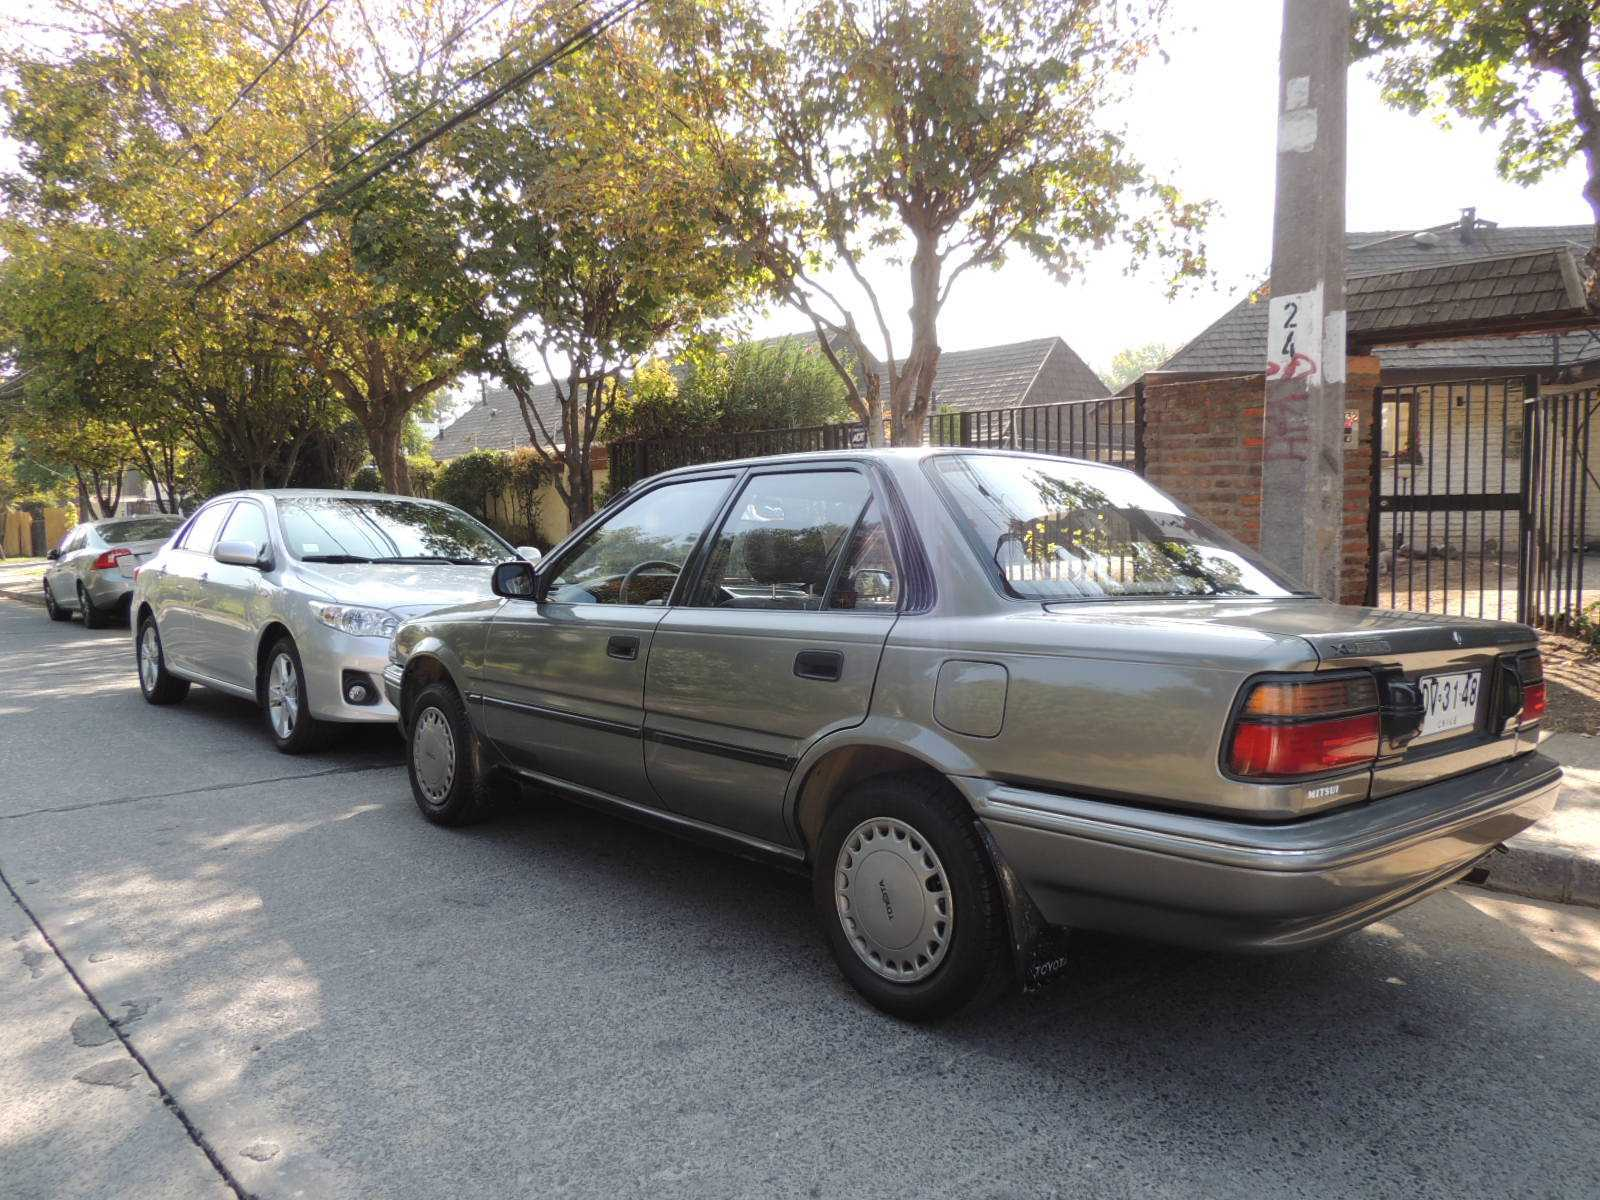 Toyota Corolla 1992 Flaco Farias Retrotest (16)